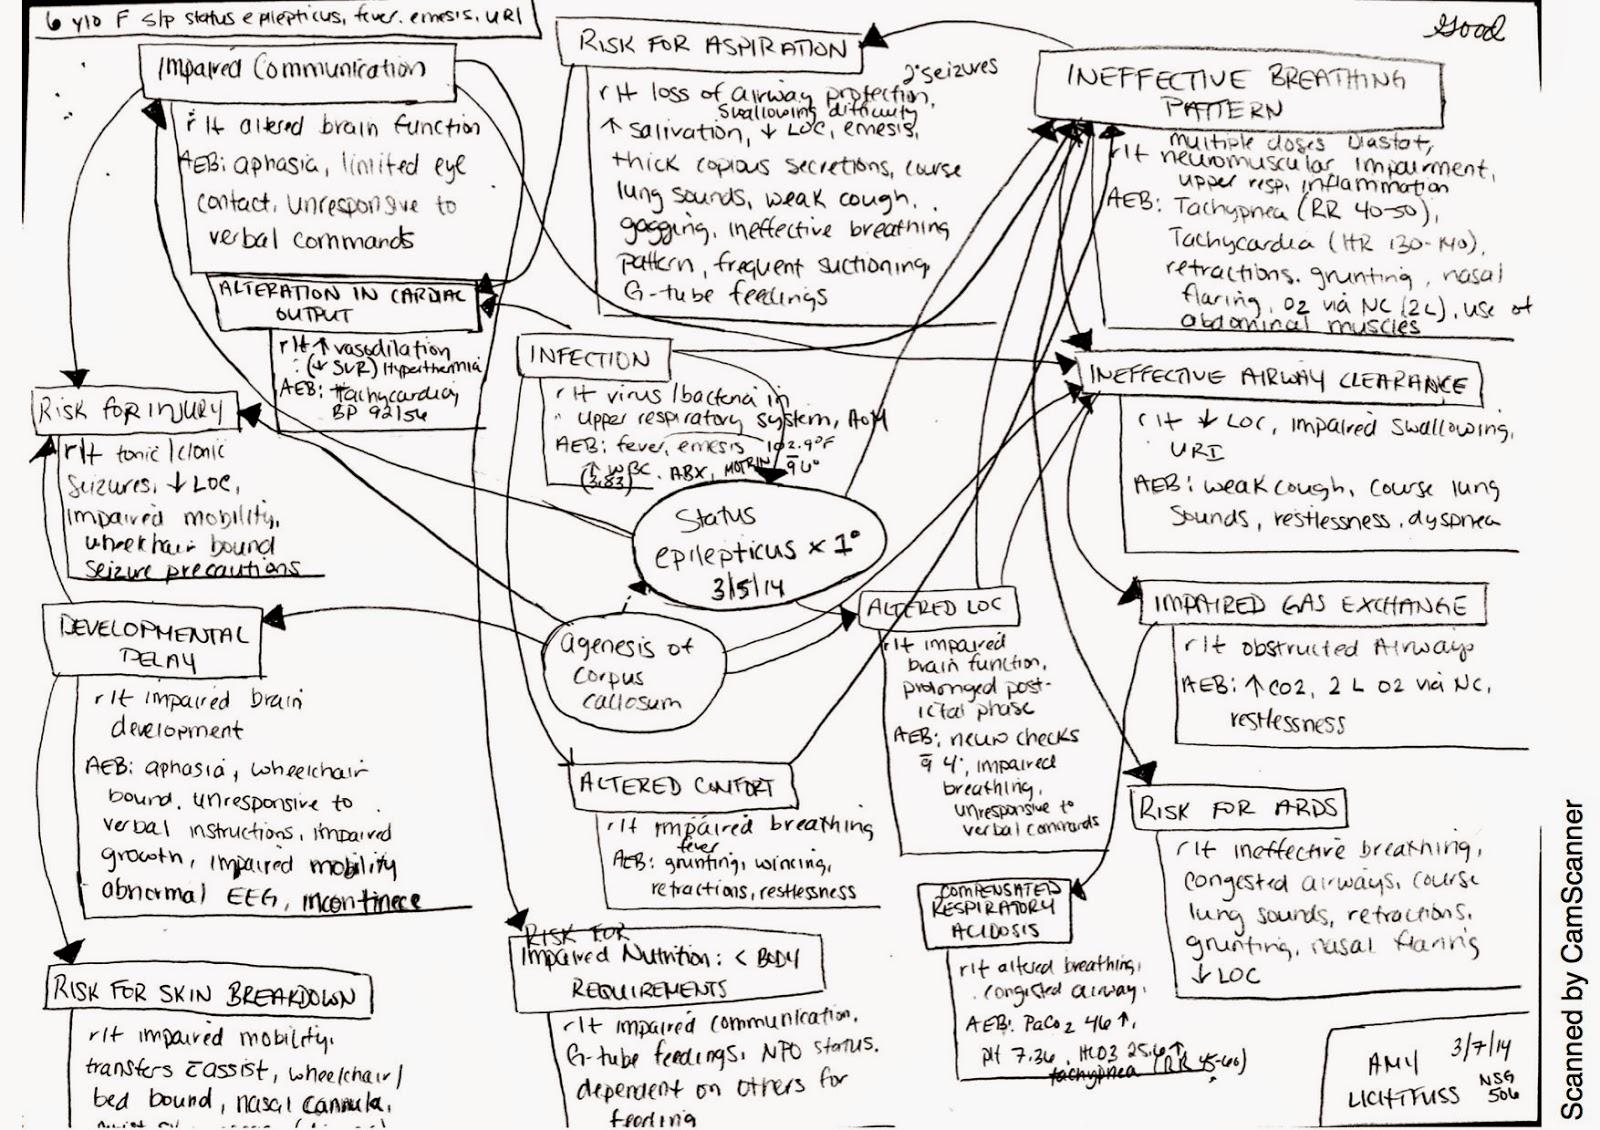 Nursing Portfolio Icu Concept Maps